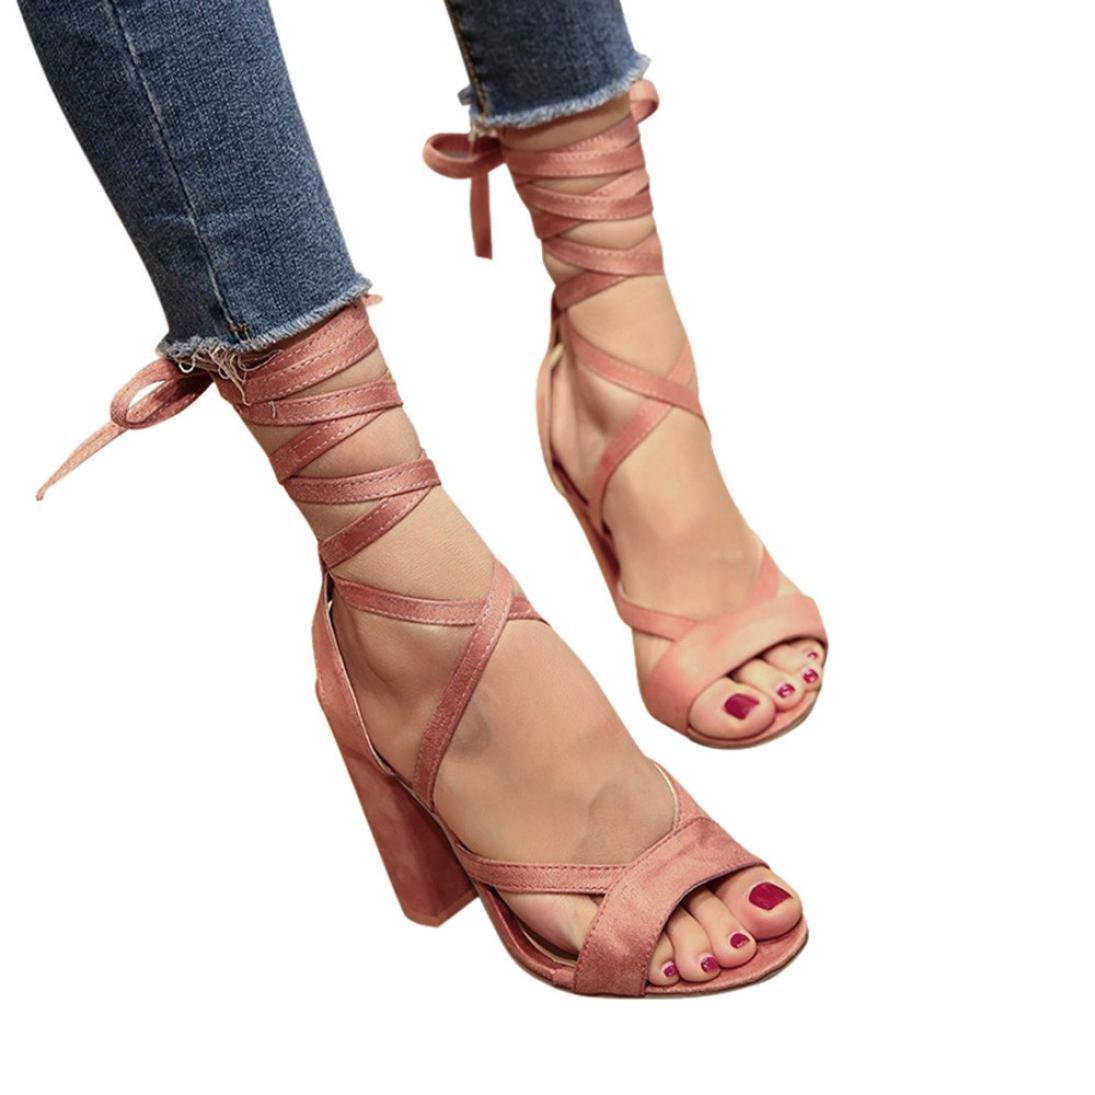 Goddessvan Womens Platform Open Toe Ankle Strap Lace up High Heel Sandals